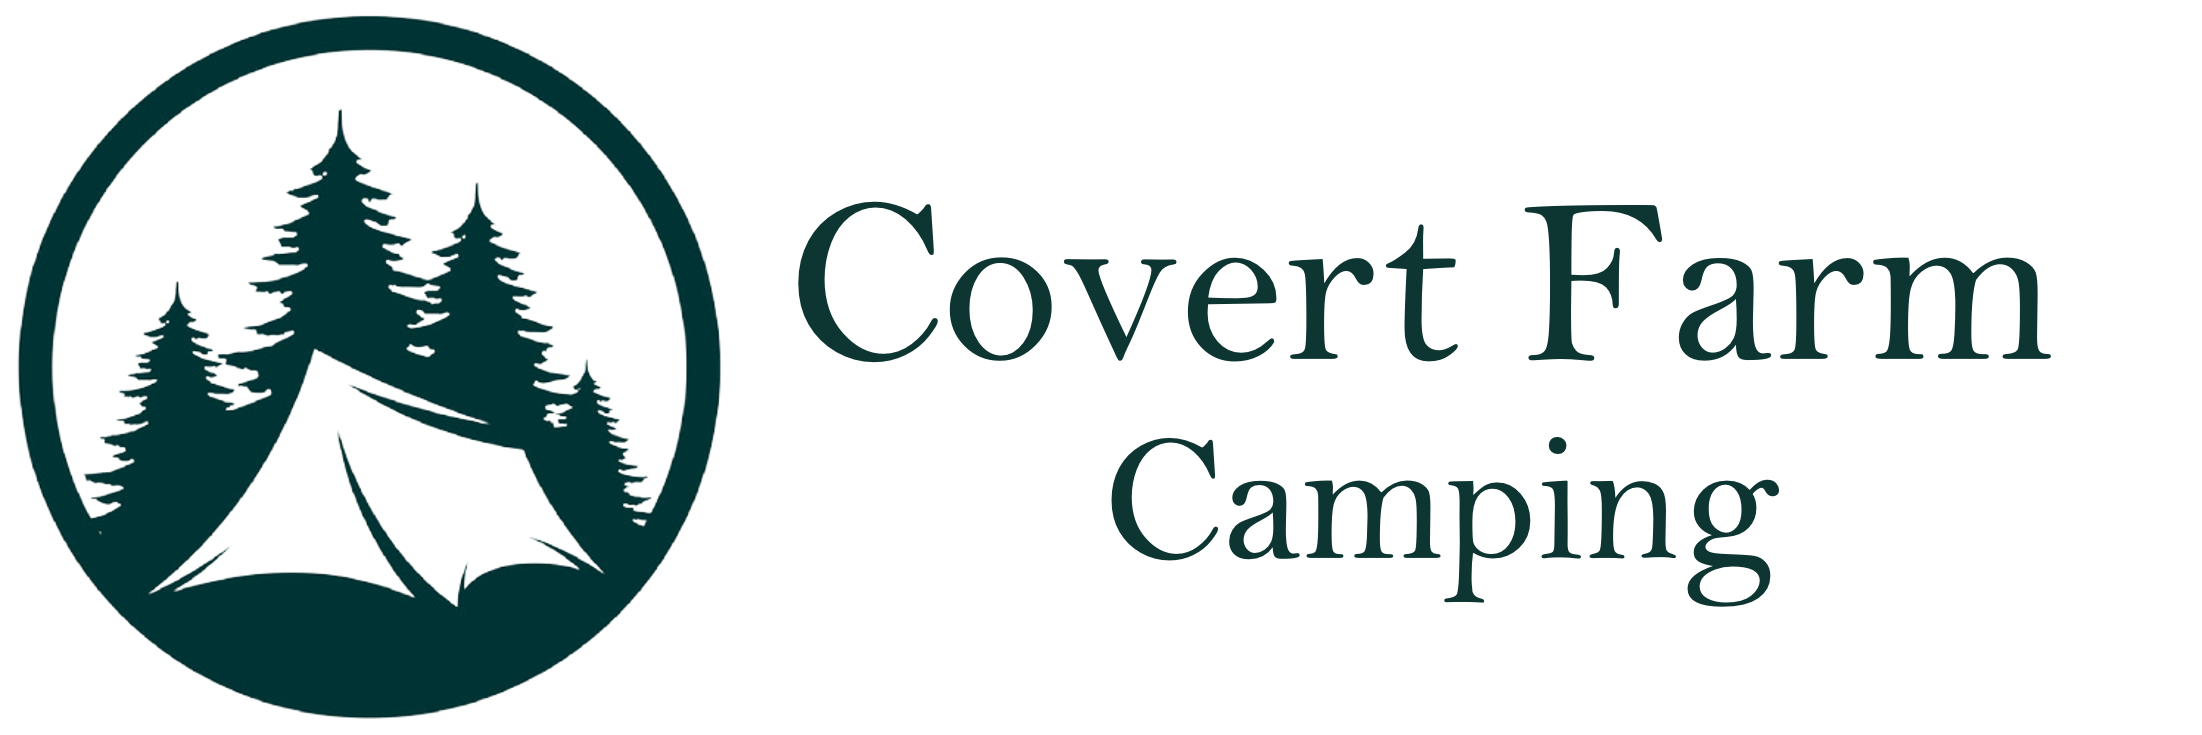 covert farm camping pembrokeshire wales logo